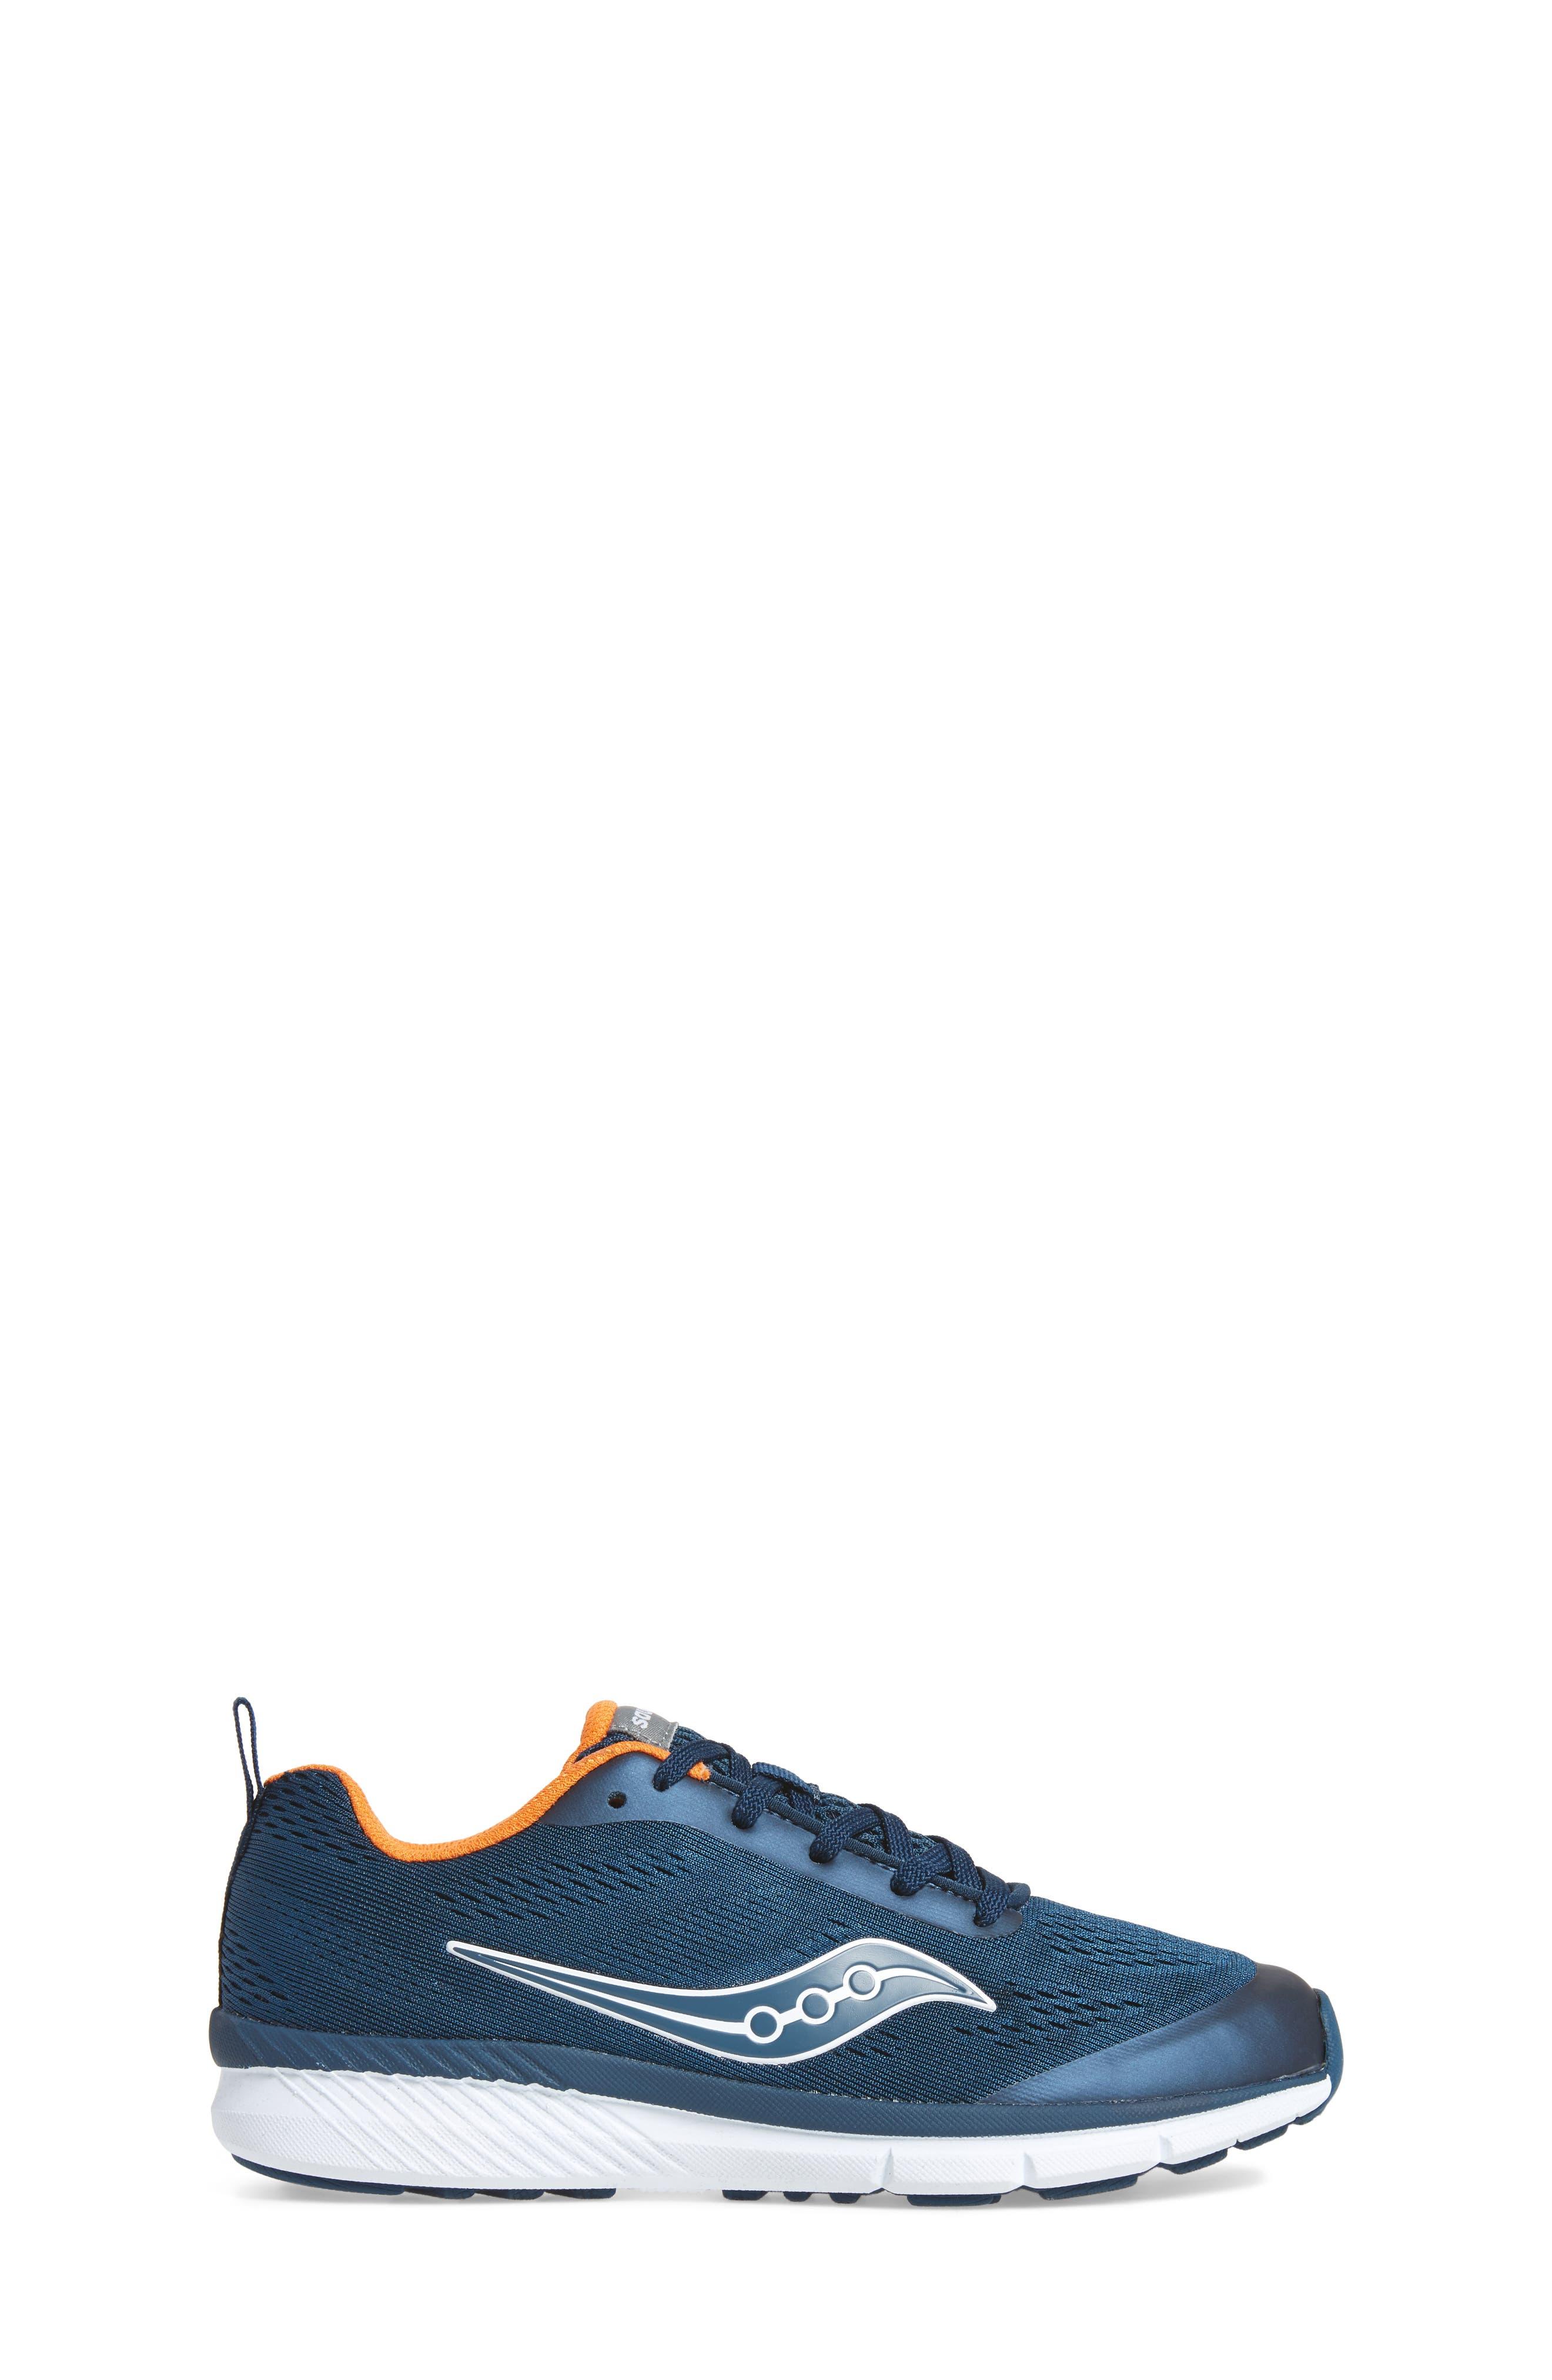 Ideal Sneaker,                             Alternate thumbnail 3, color,                             410